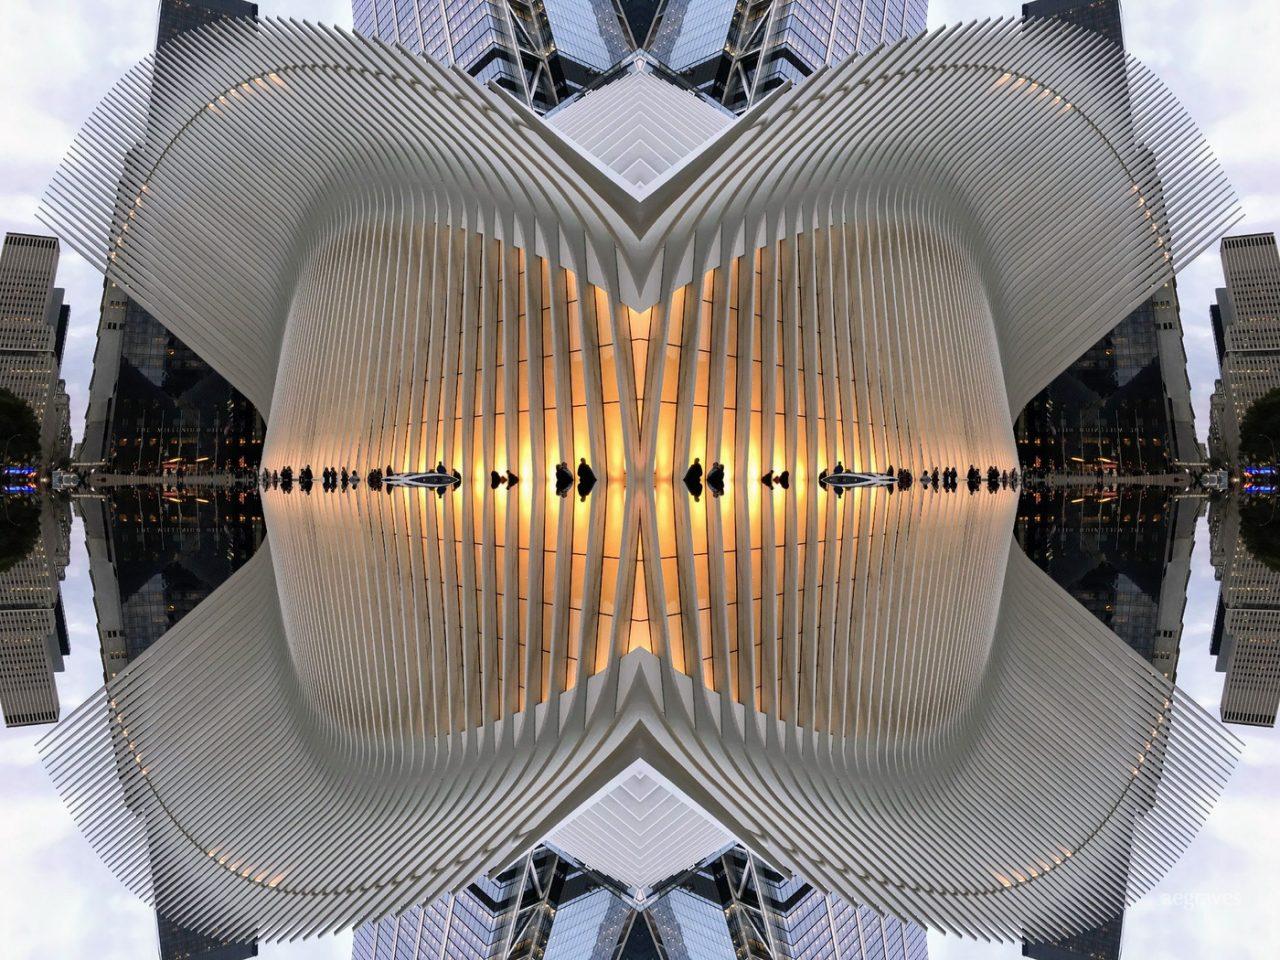 Interpretations of the WTC Oculus Building